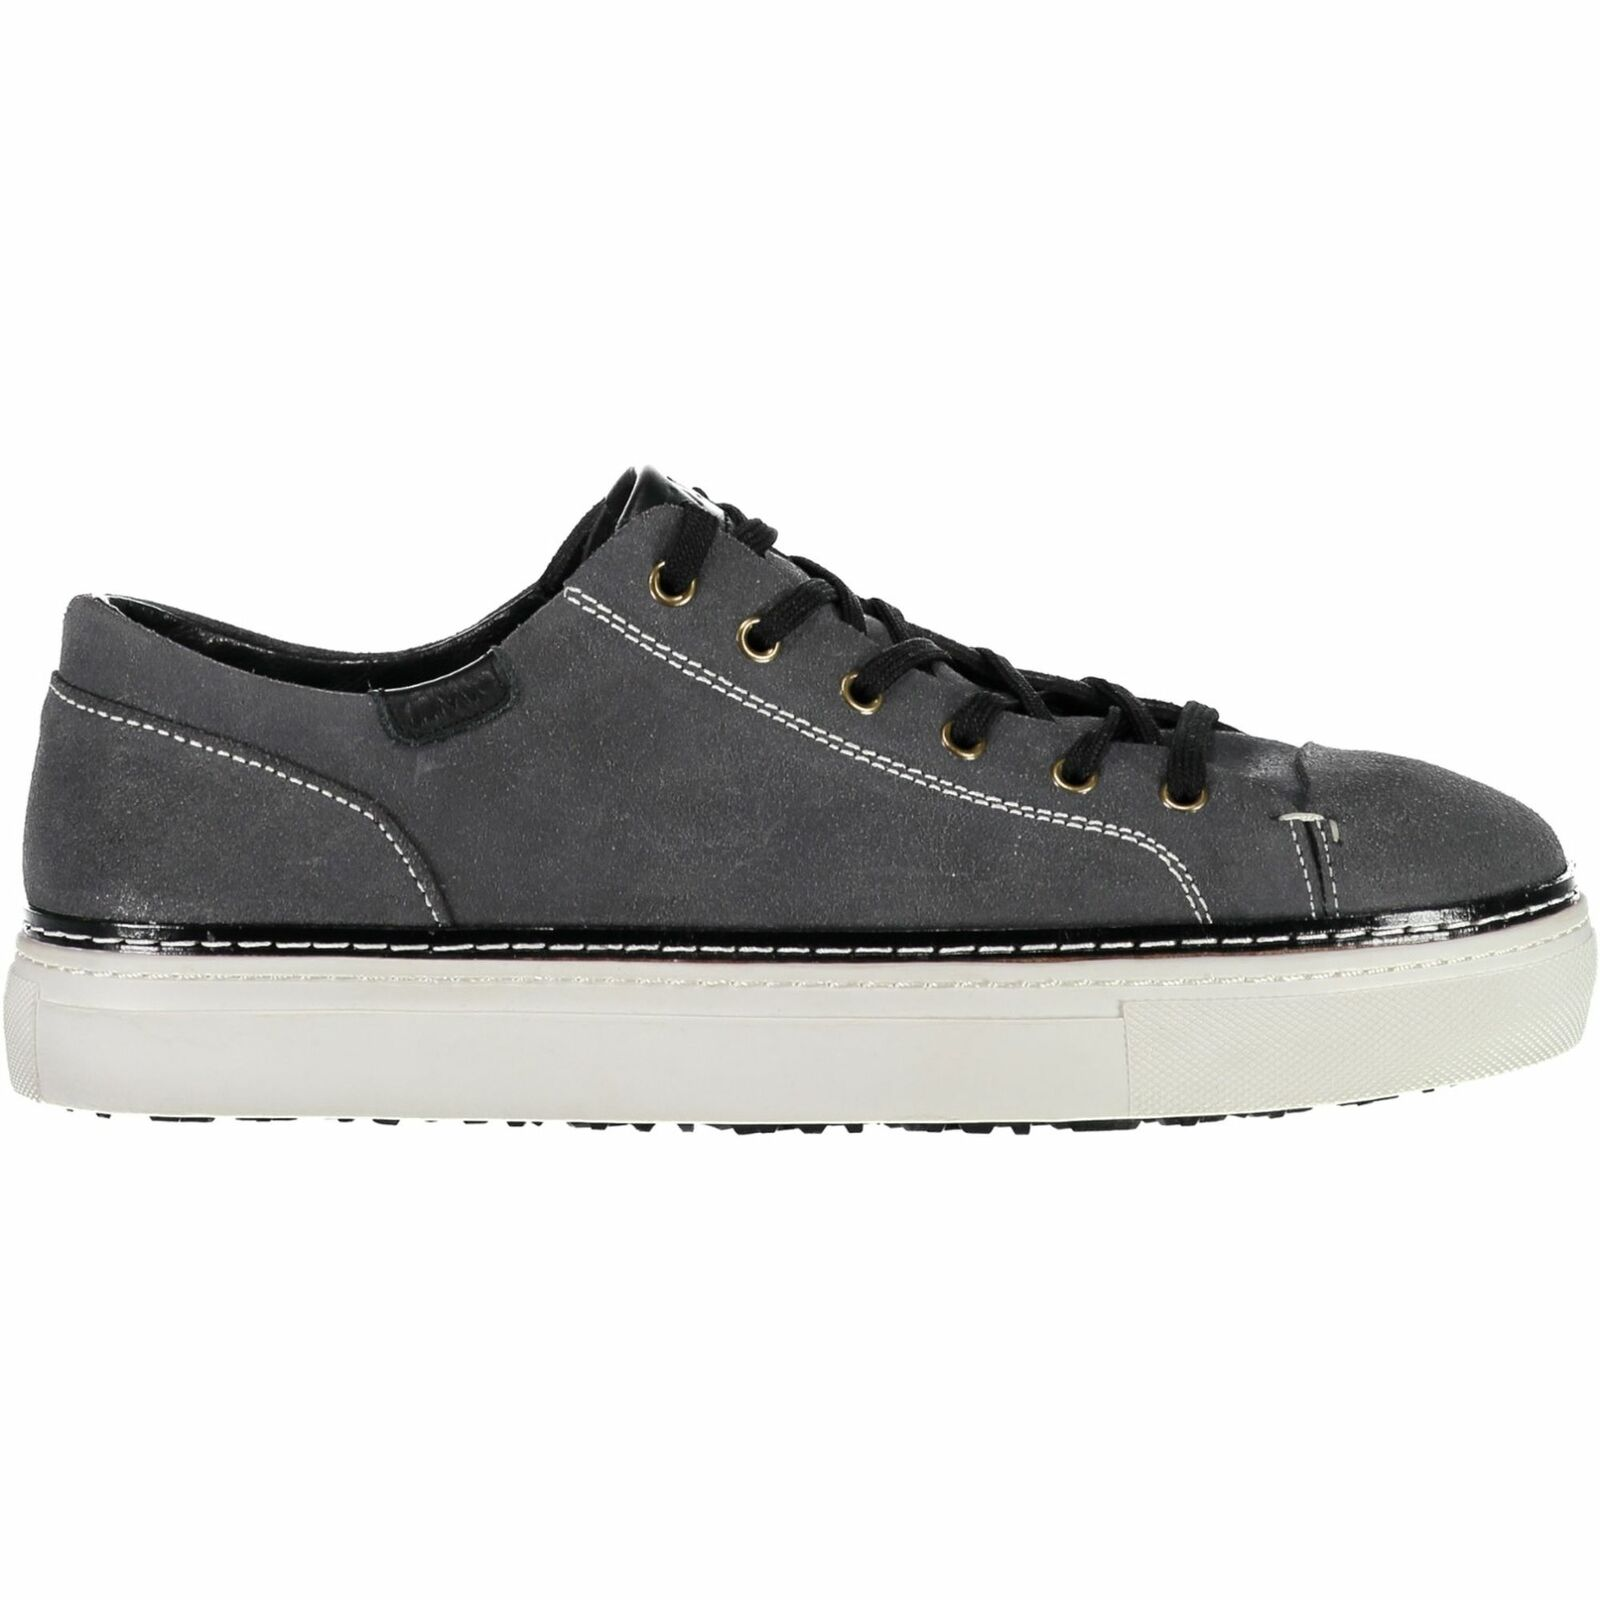 CMP Sneaker LIBERTAS LIFESTYLE SHOE grey Unifarben Wildleder atmungsaktive Sohle